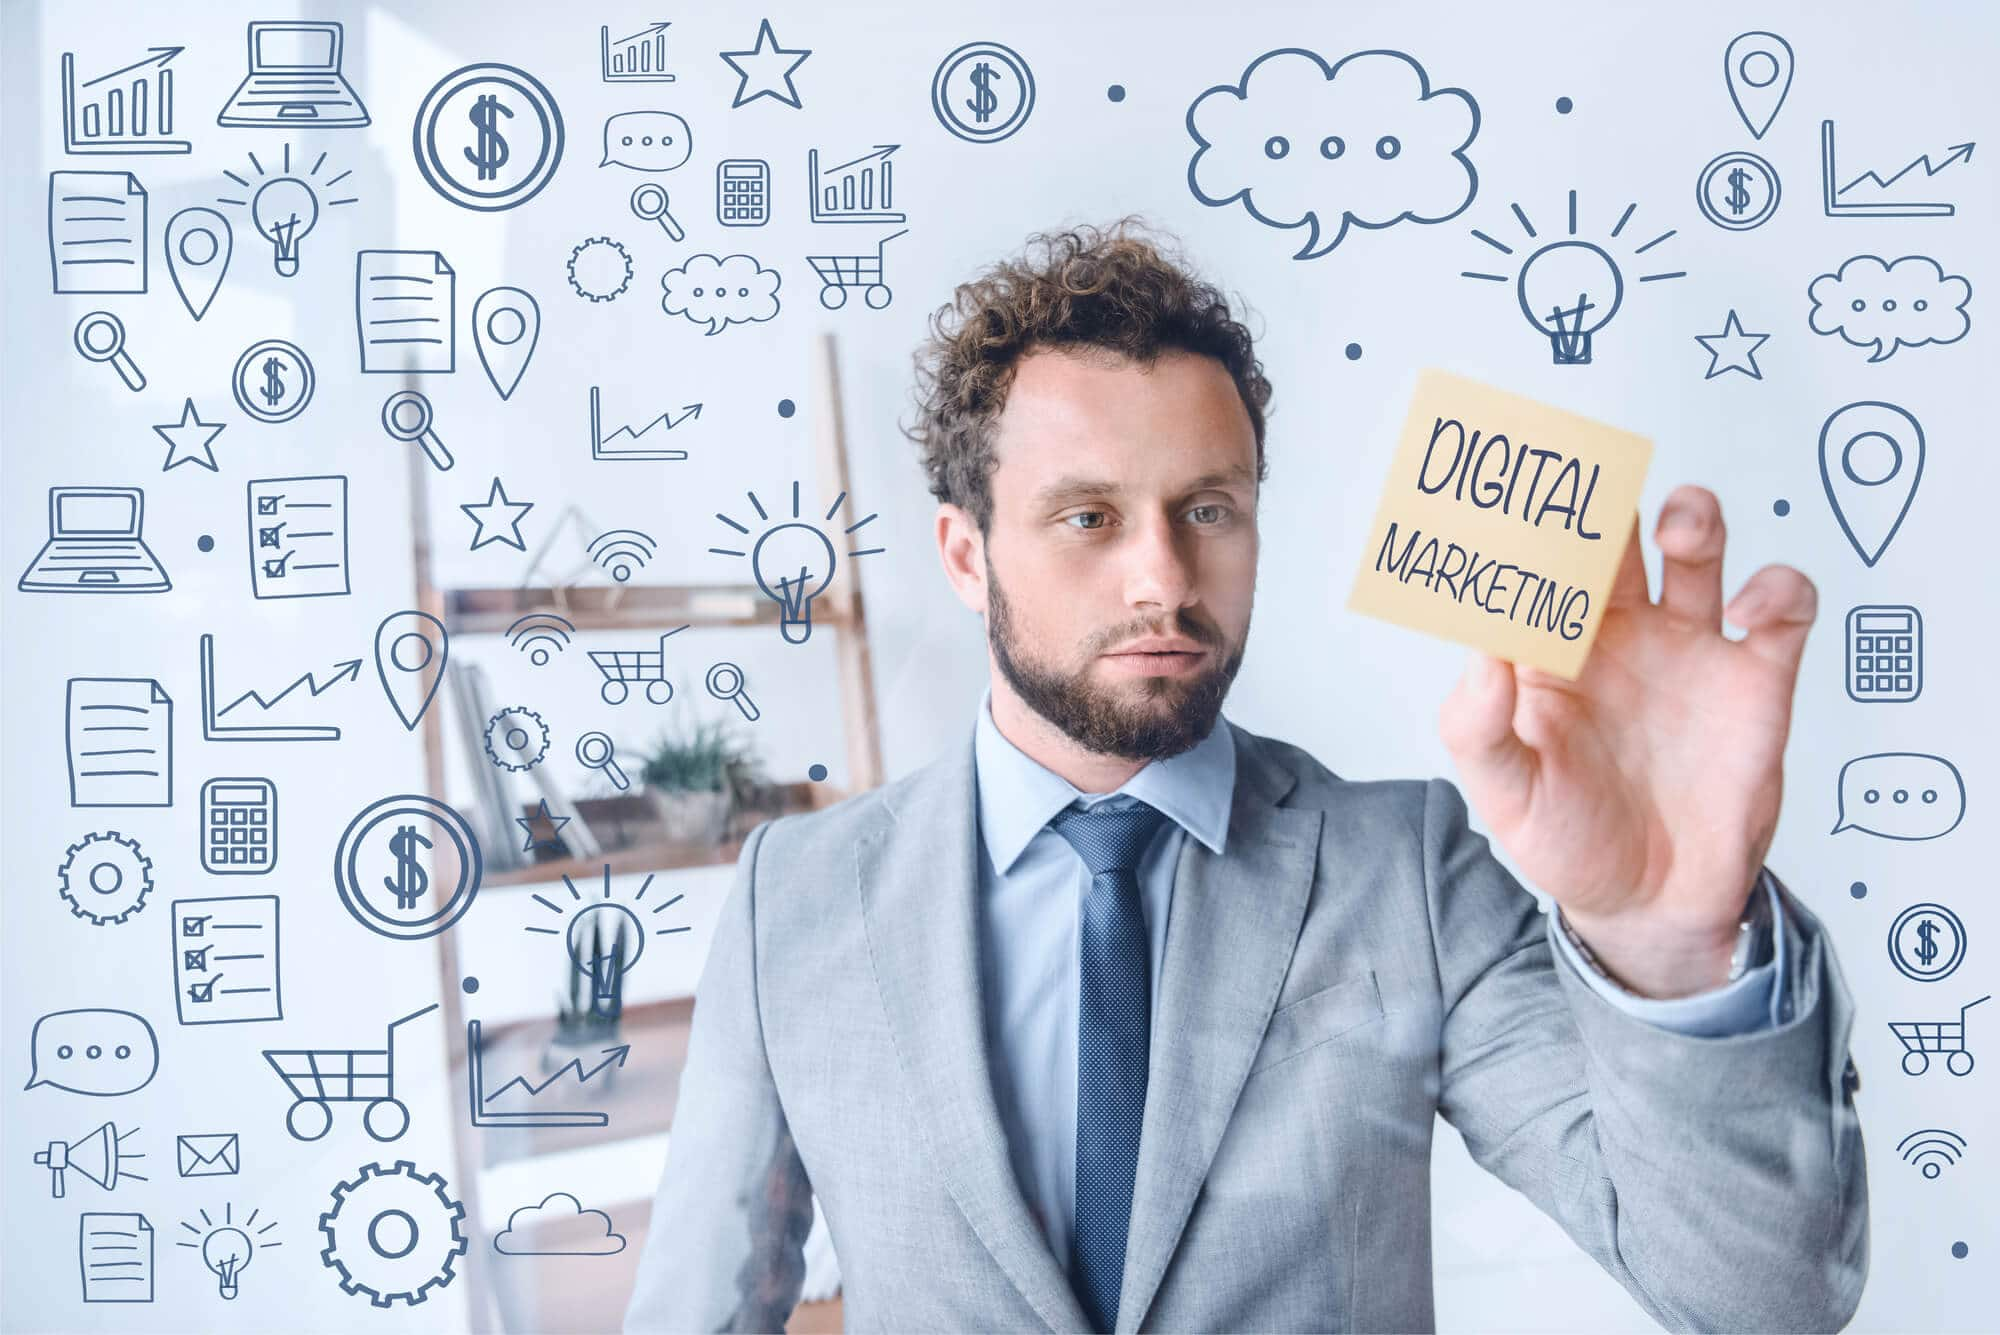 Web Design & Digital Marketing Agency in Shreveport - Big Easy SEO